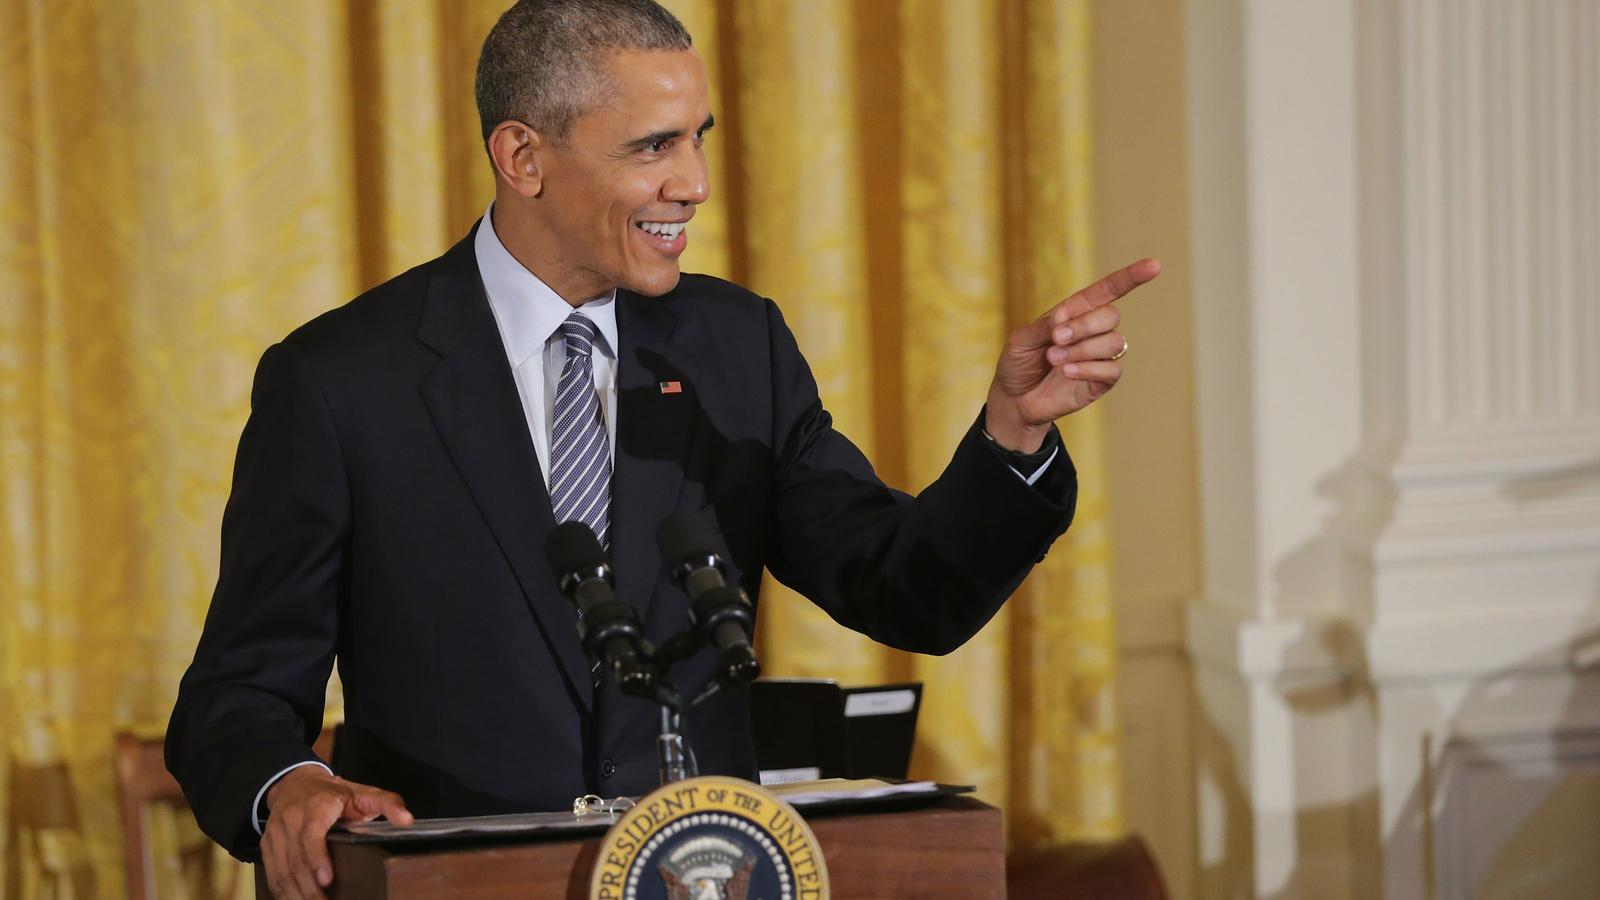 Barack Obama (kind of) welcomes Tim Howard to the Colorado Rapids